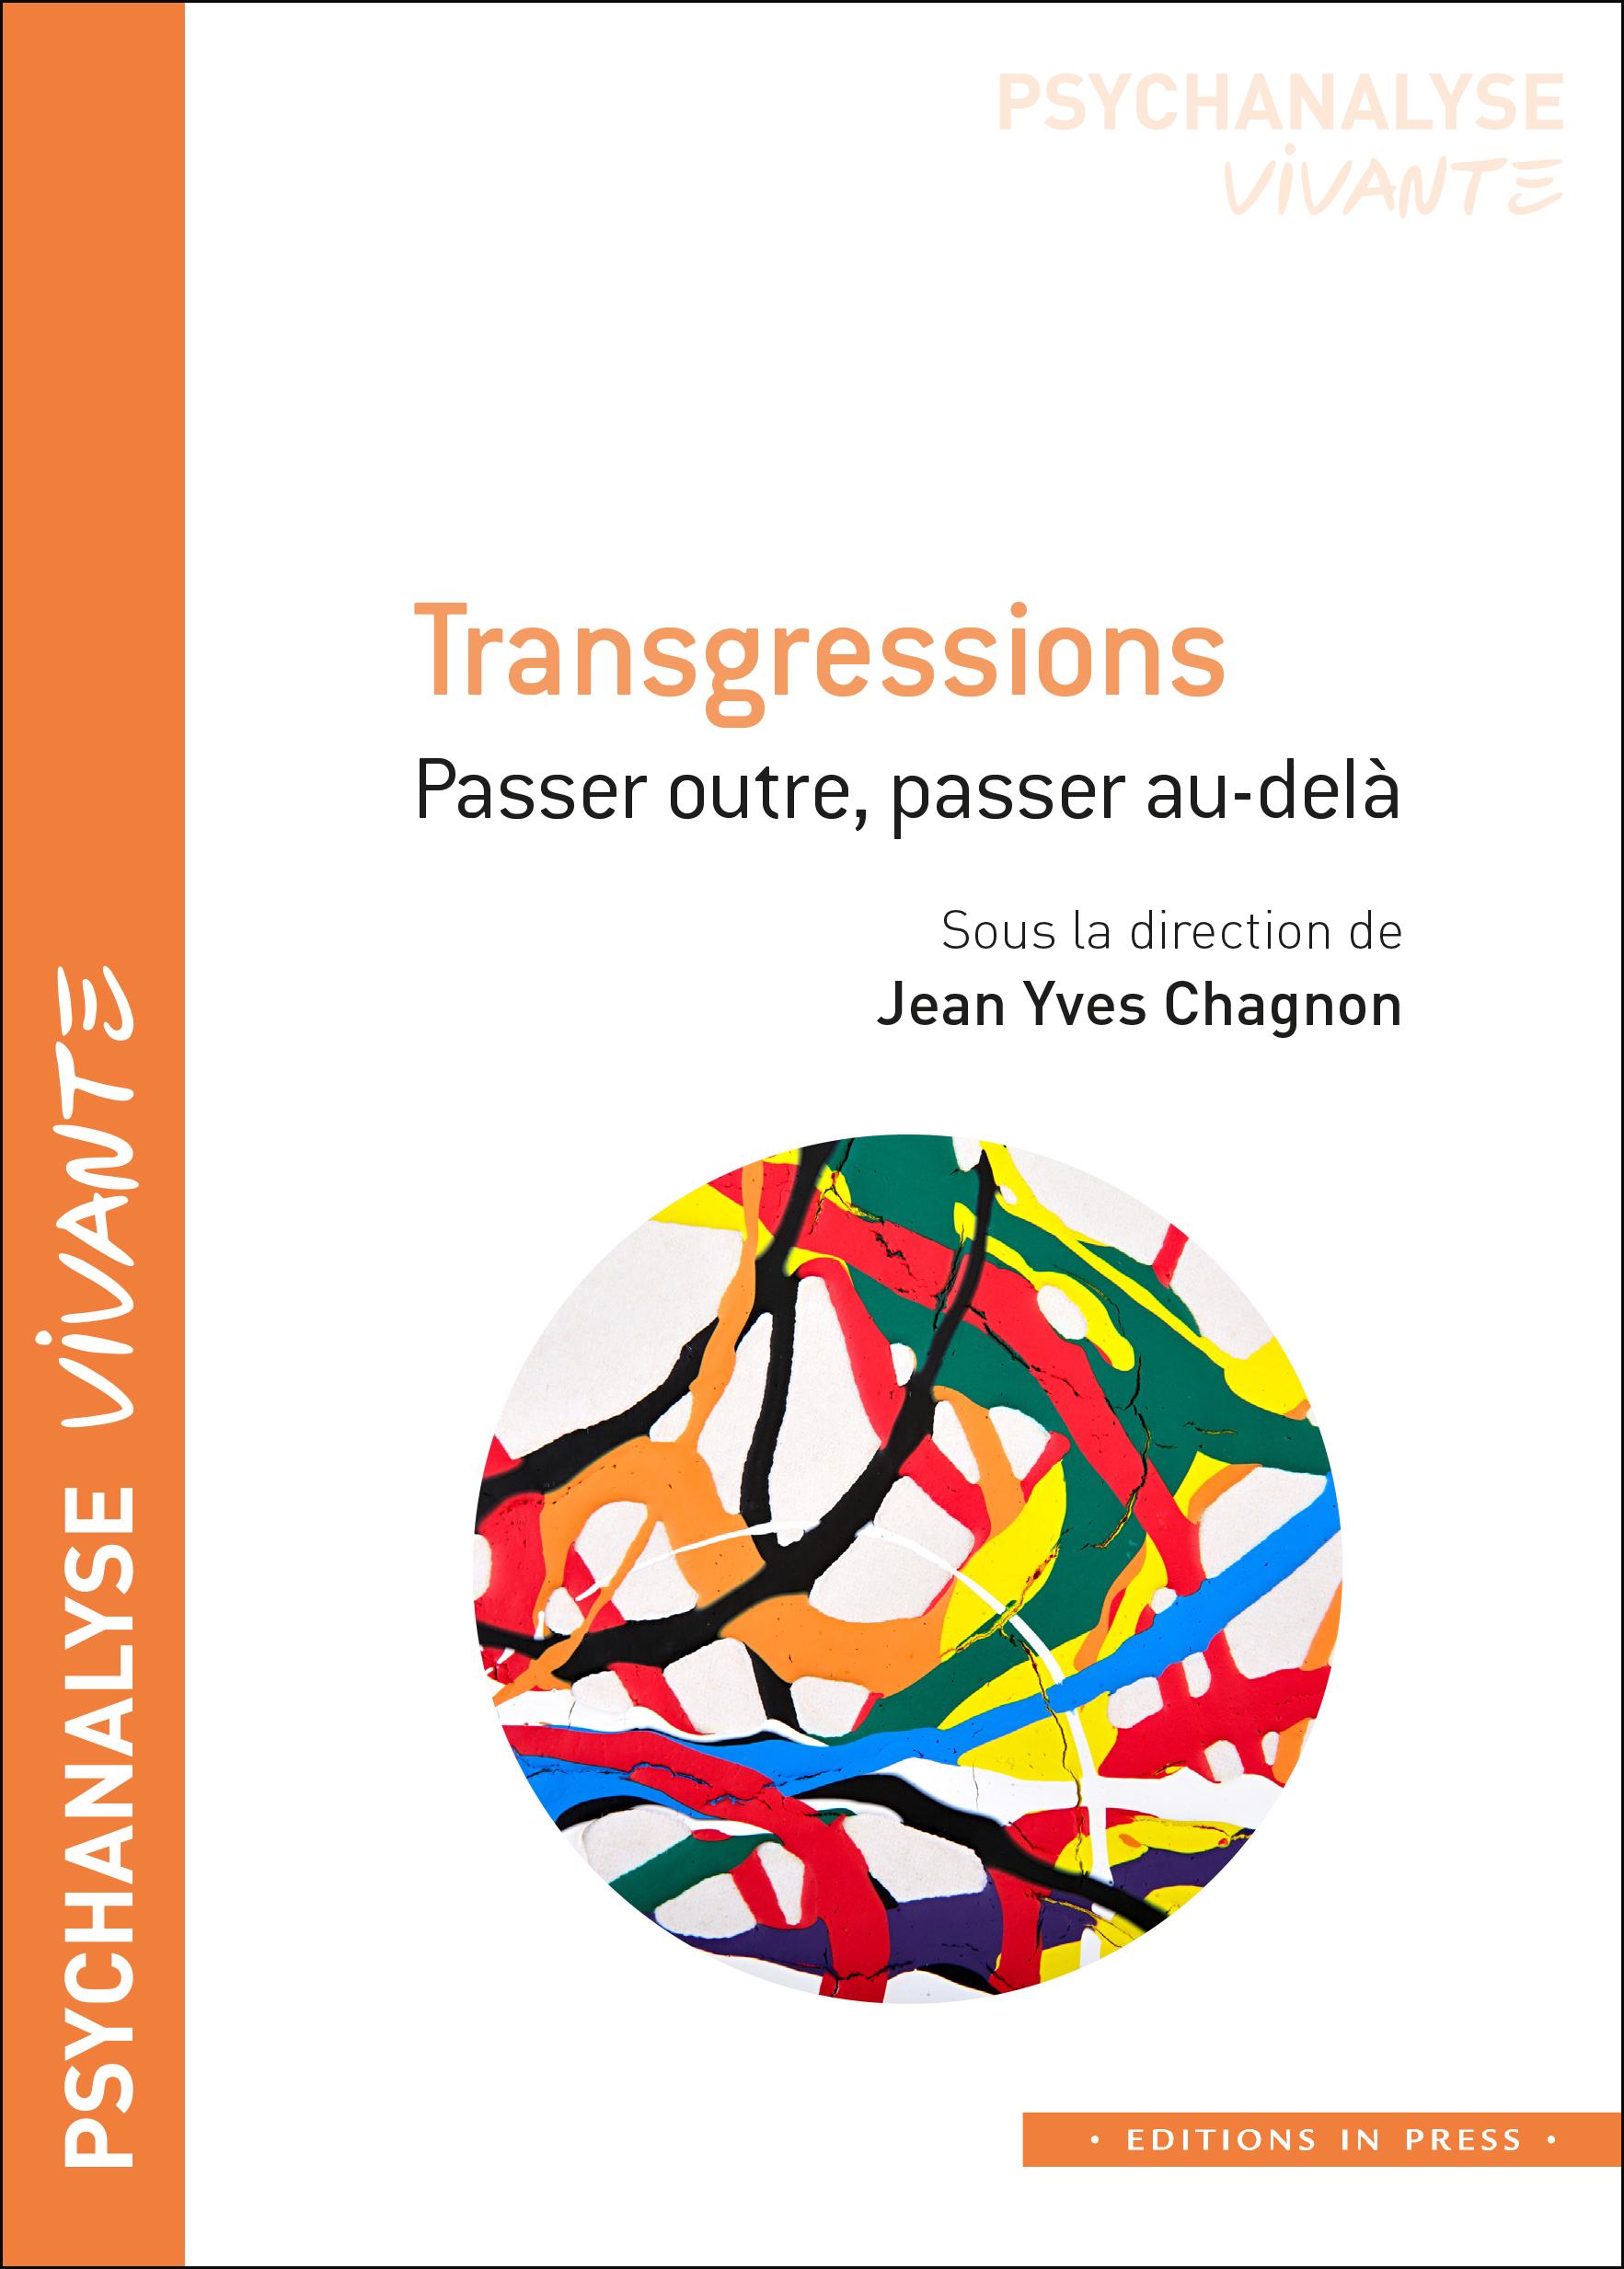 TRANSGRESSIONS - PASSER OUTRE, PASSER AU-DELA